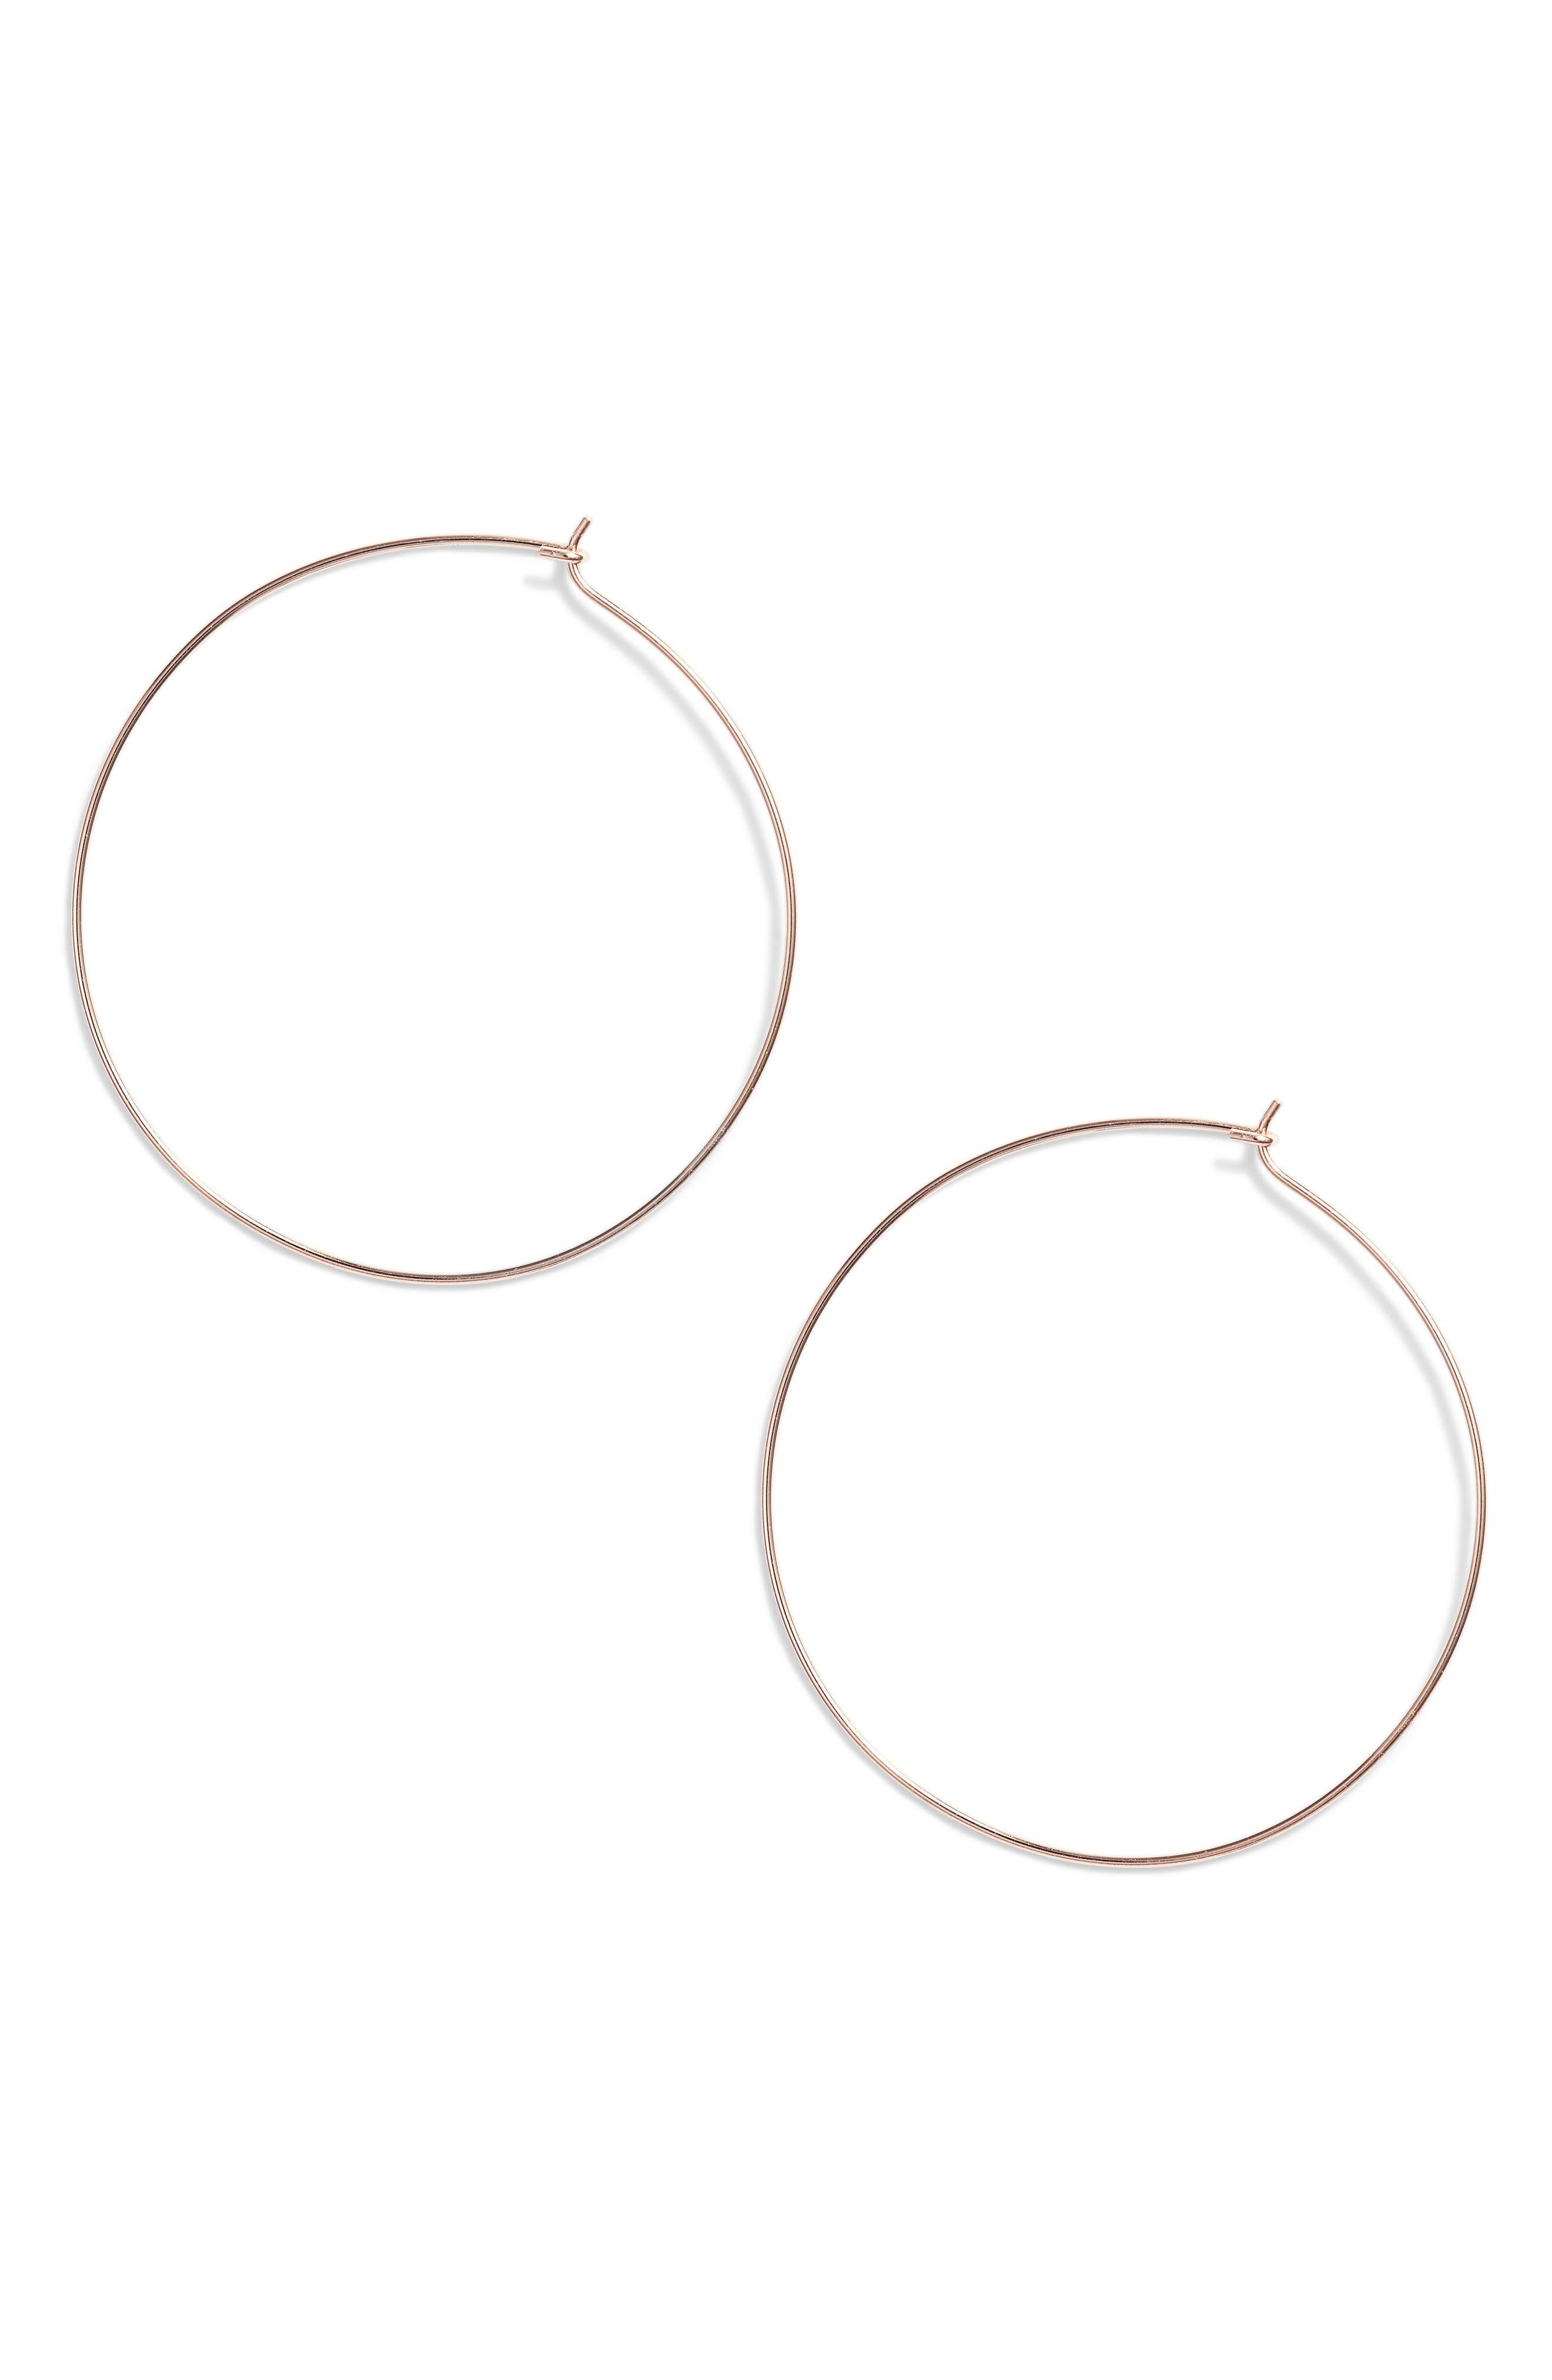 Thin Hoop Earrings,                             Main thumbnail 1, color,                             ROSE GOLD